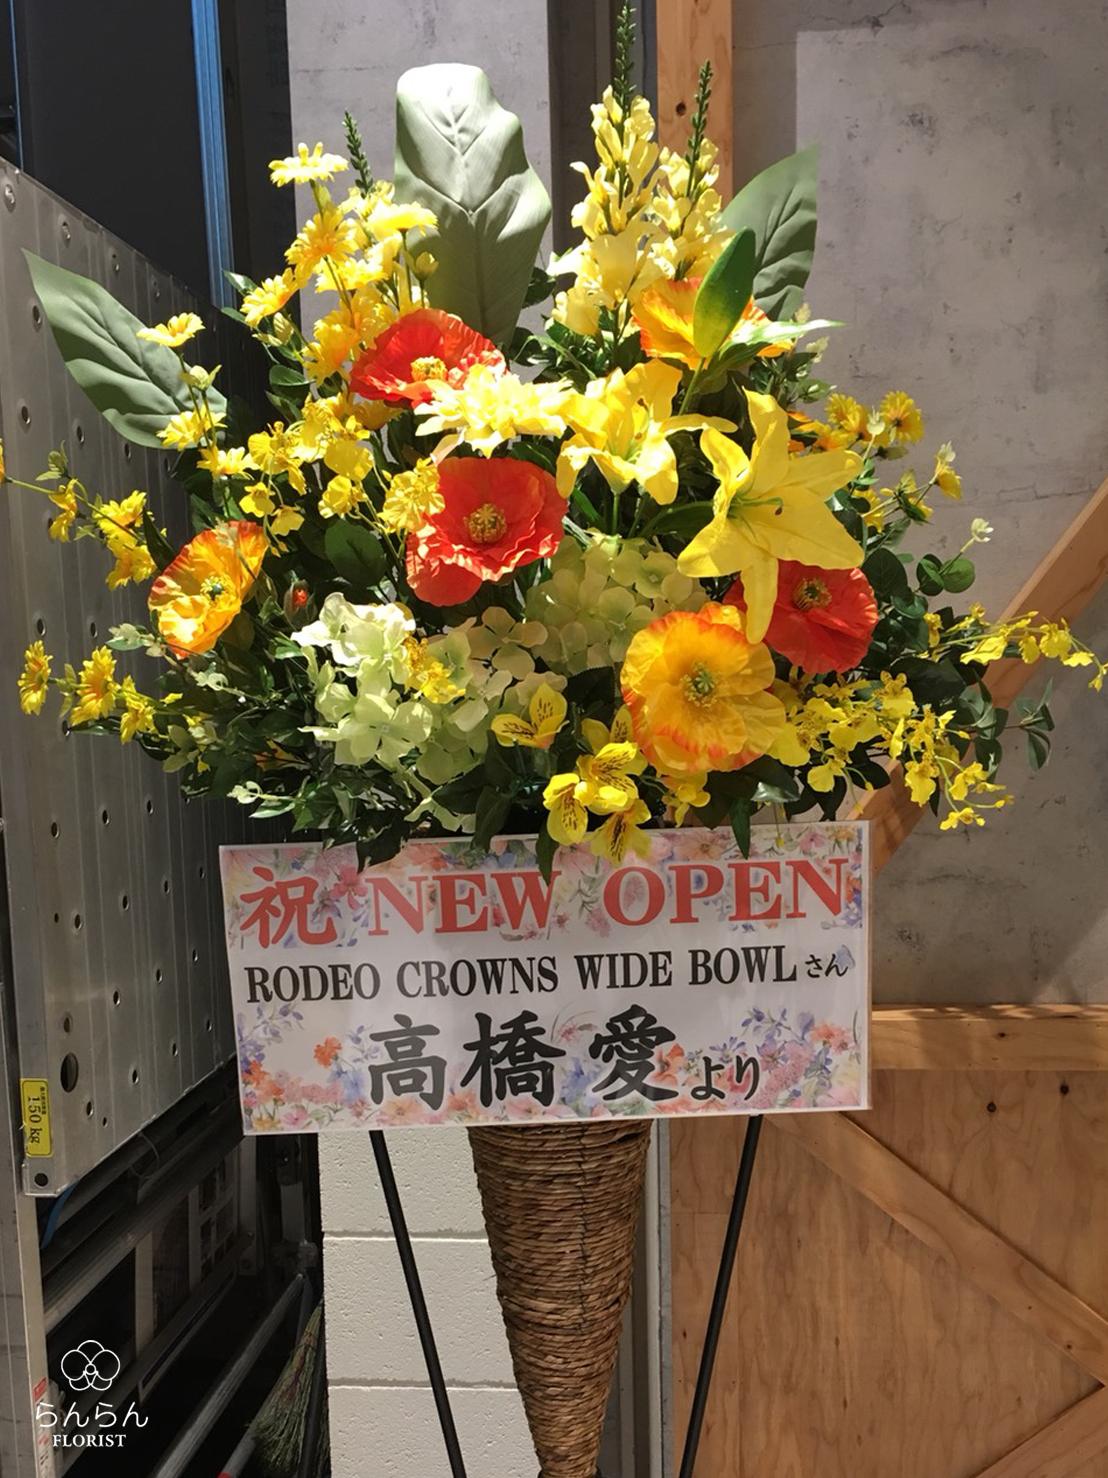 RODEO CROWNS WIDE BOWL イオンモール福岡店